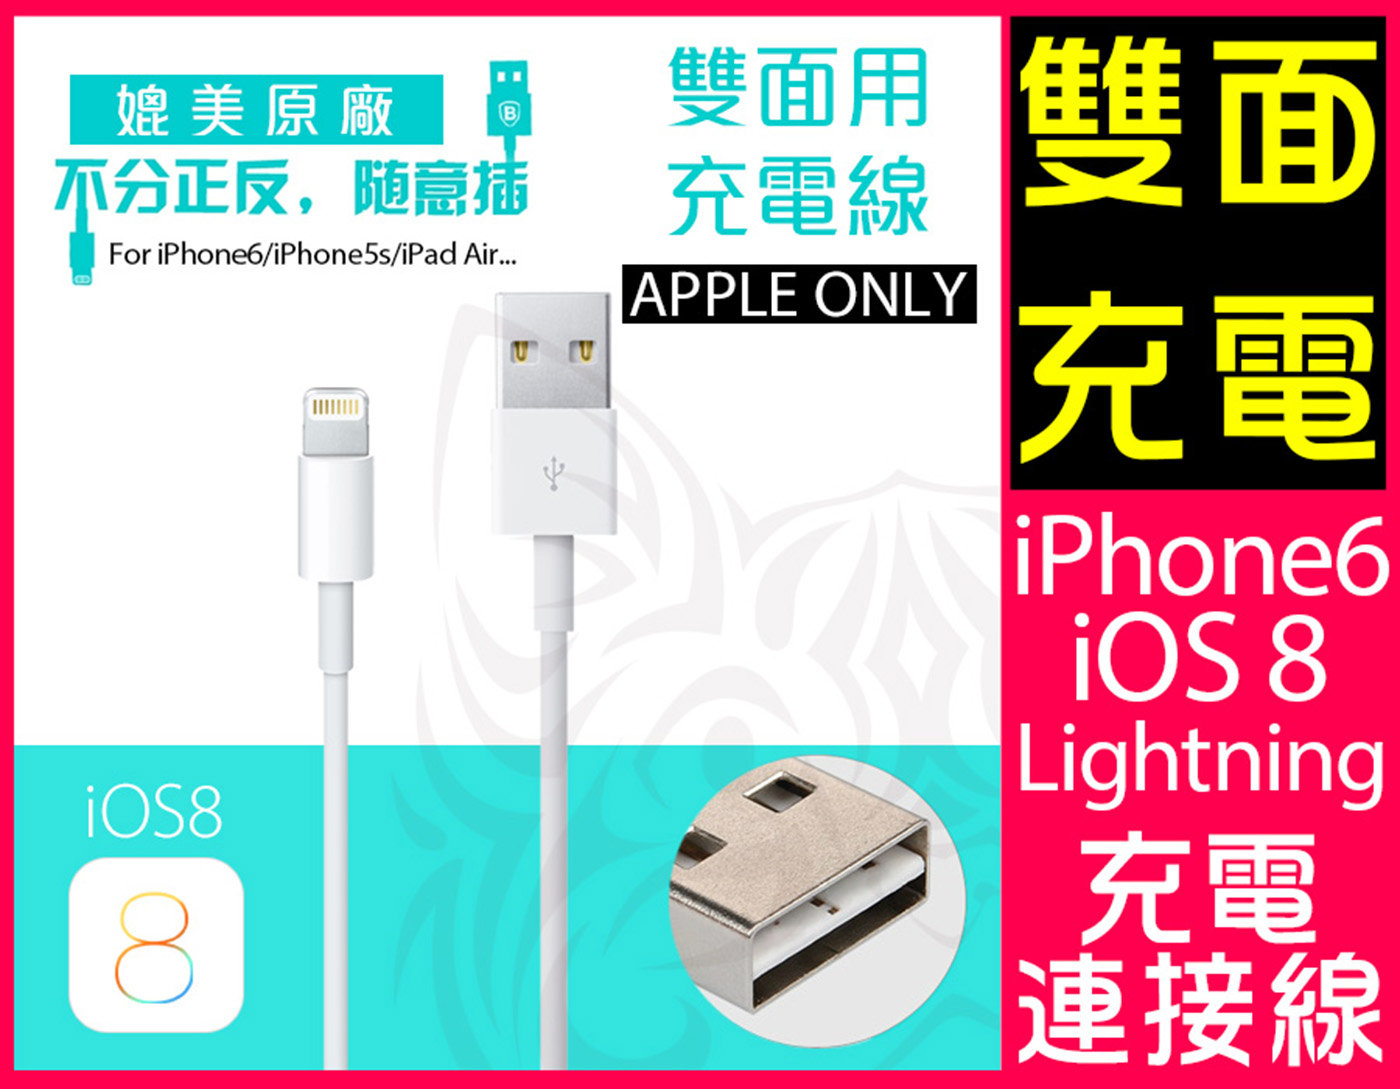 iPhone / iPad 系列 雙面充連接線 【D-I5-008】 USB雙面充電線 8pin數據線